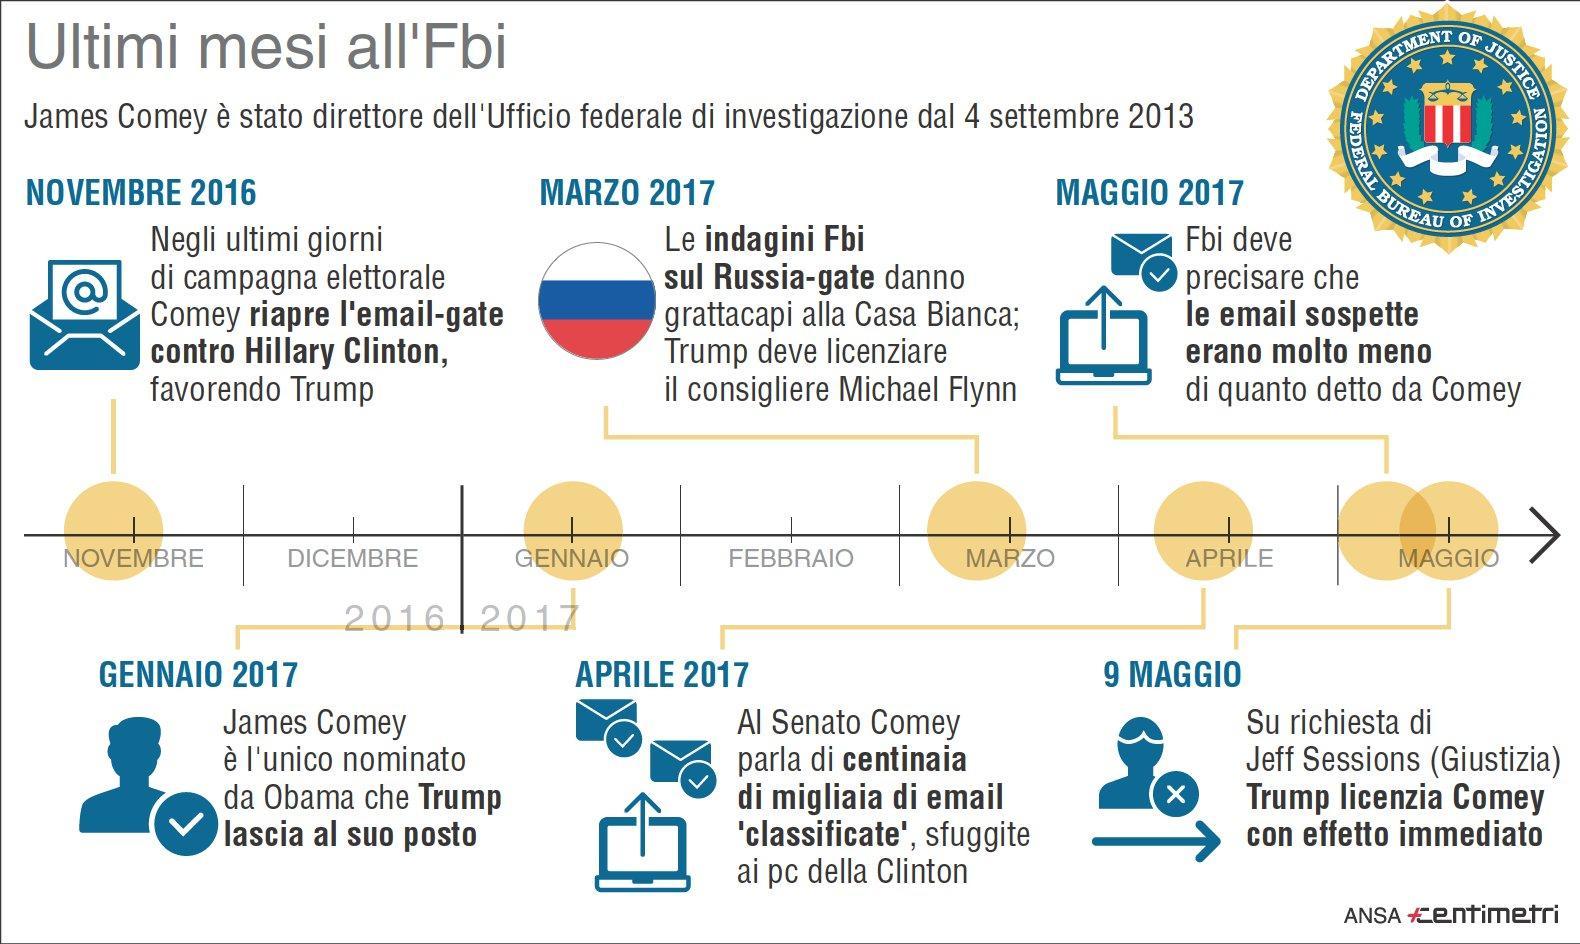 Gli ultimi mesi di James Comey all Fbi